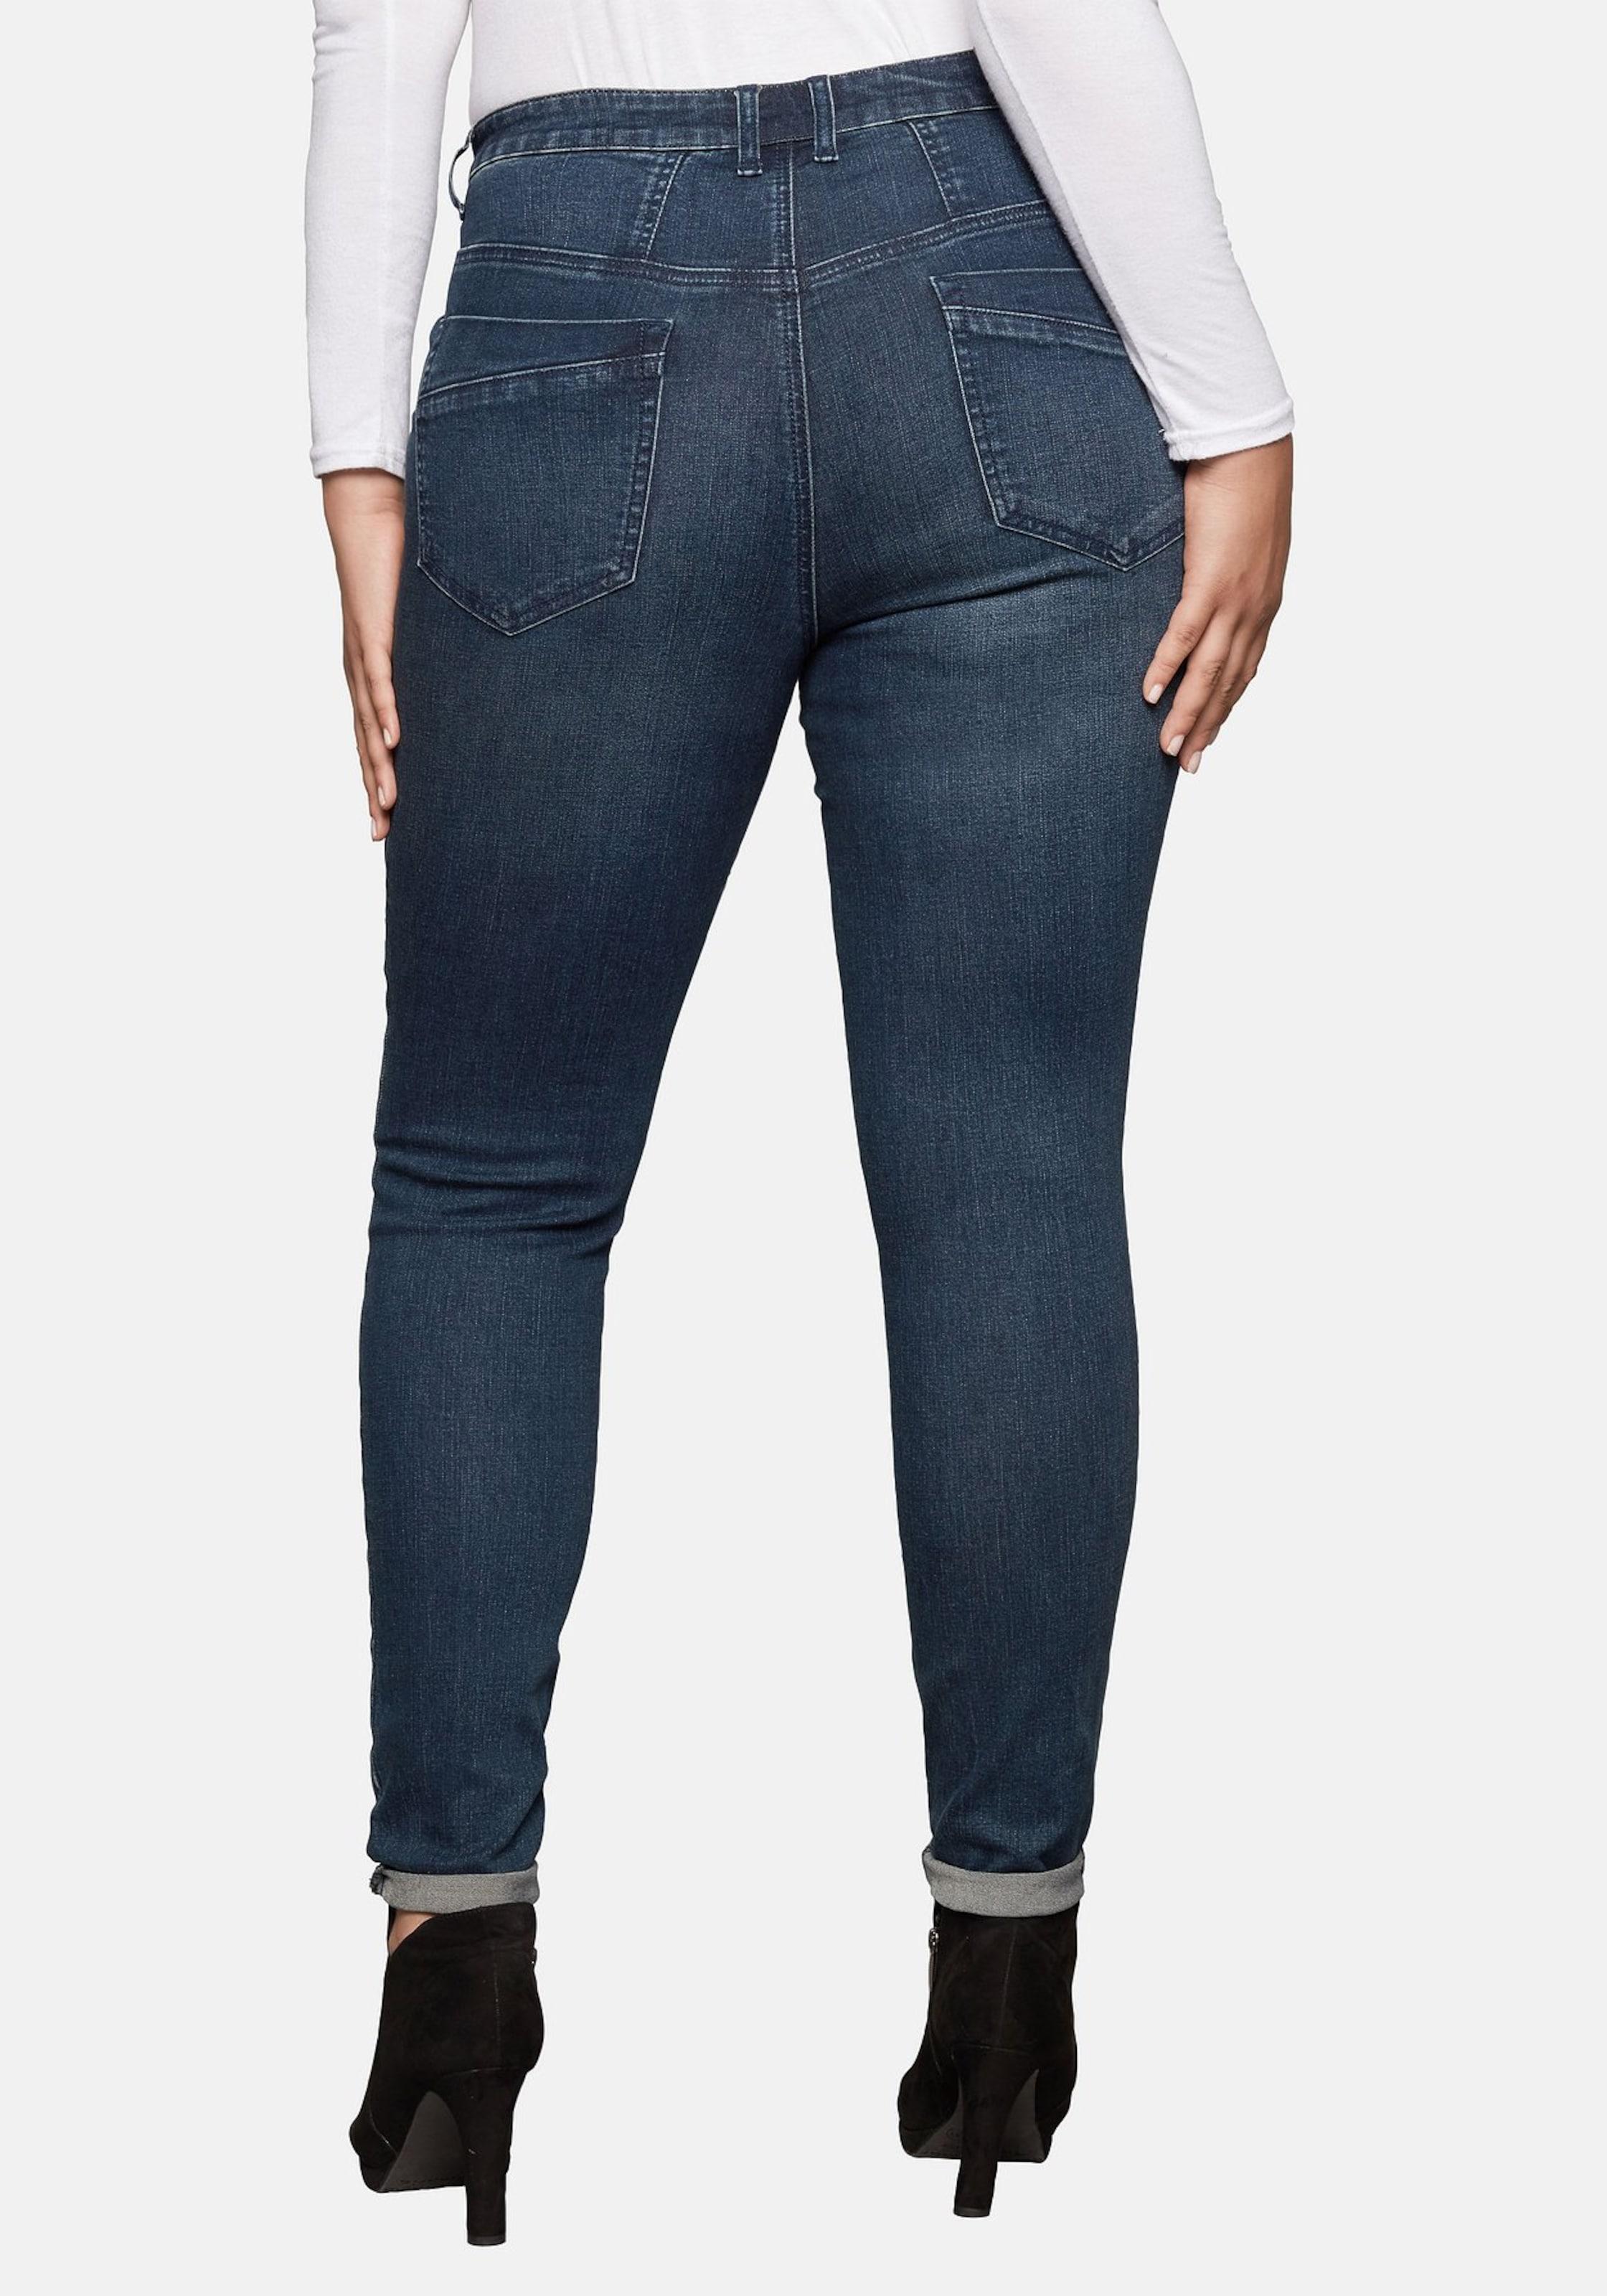 Dunkelblau Jeans Dunkelblau Sheego Jeans Jeans Dunkelblau In In Sheego Jeans In In Sheego Sheego 9EDYHW2I